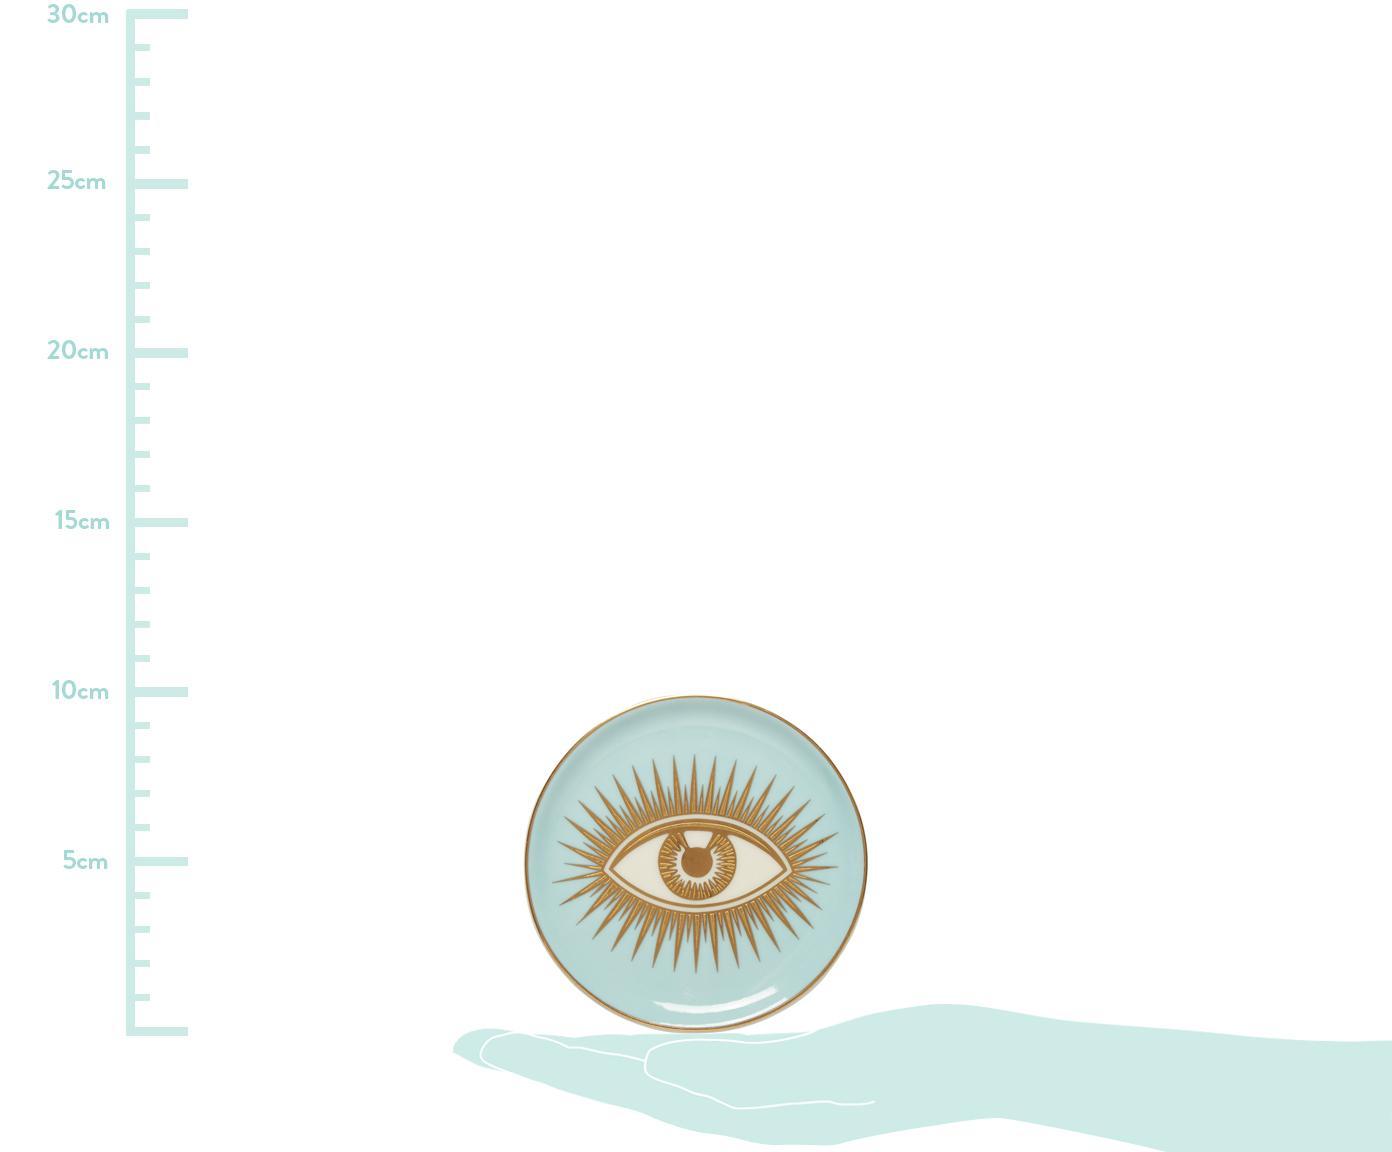 Designer Untersetzer Le Wink, 4er-Set, Porzellan, Mehrfarbig, Ø 10 x H 2 cm